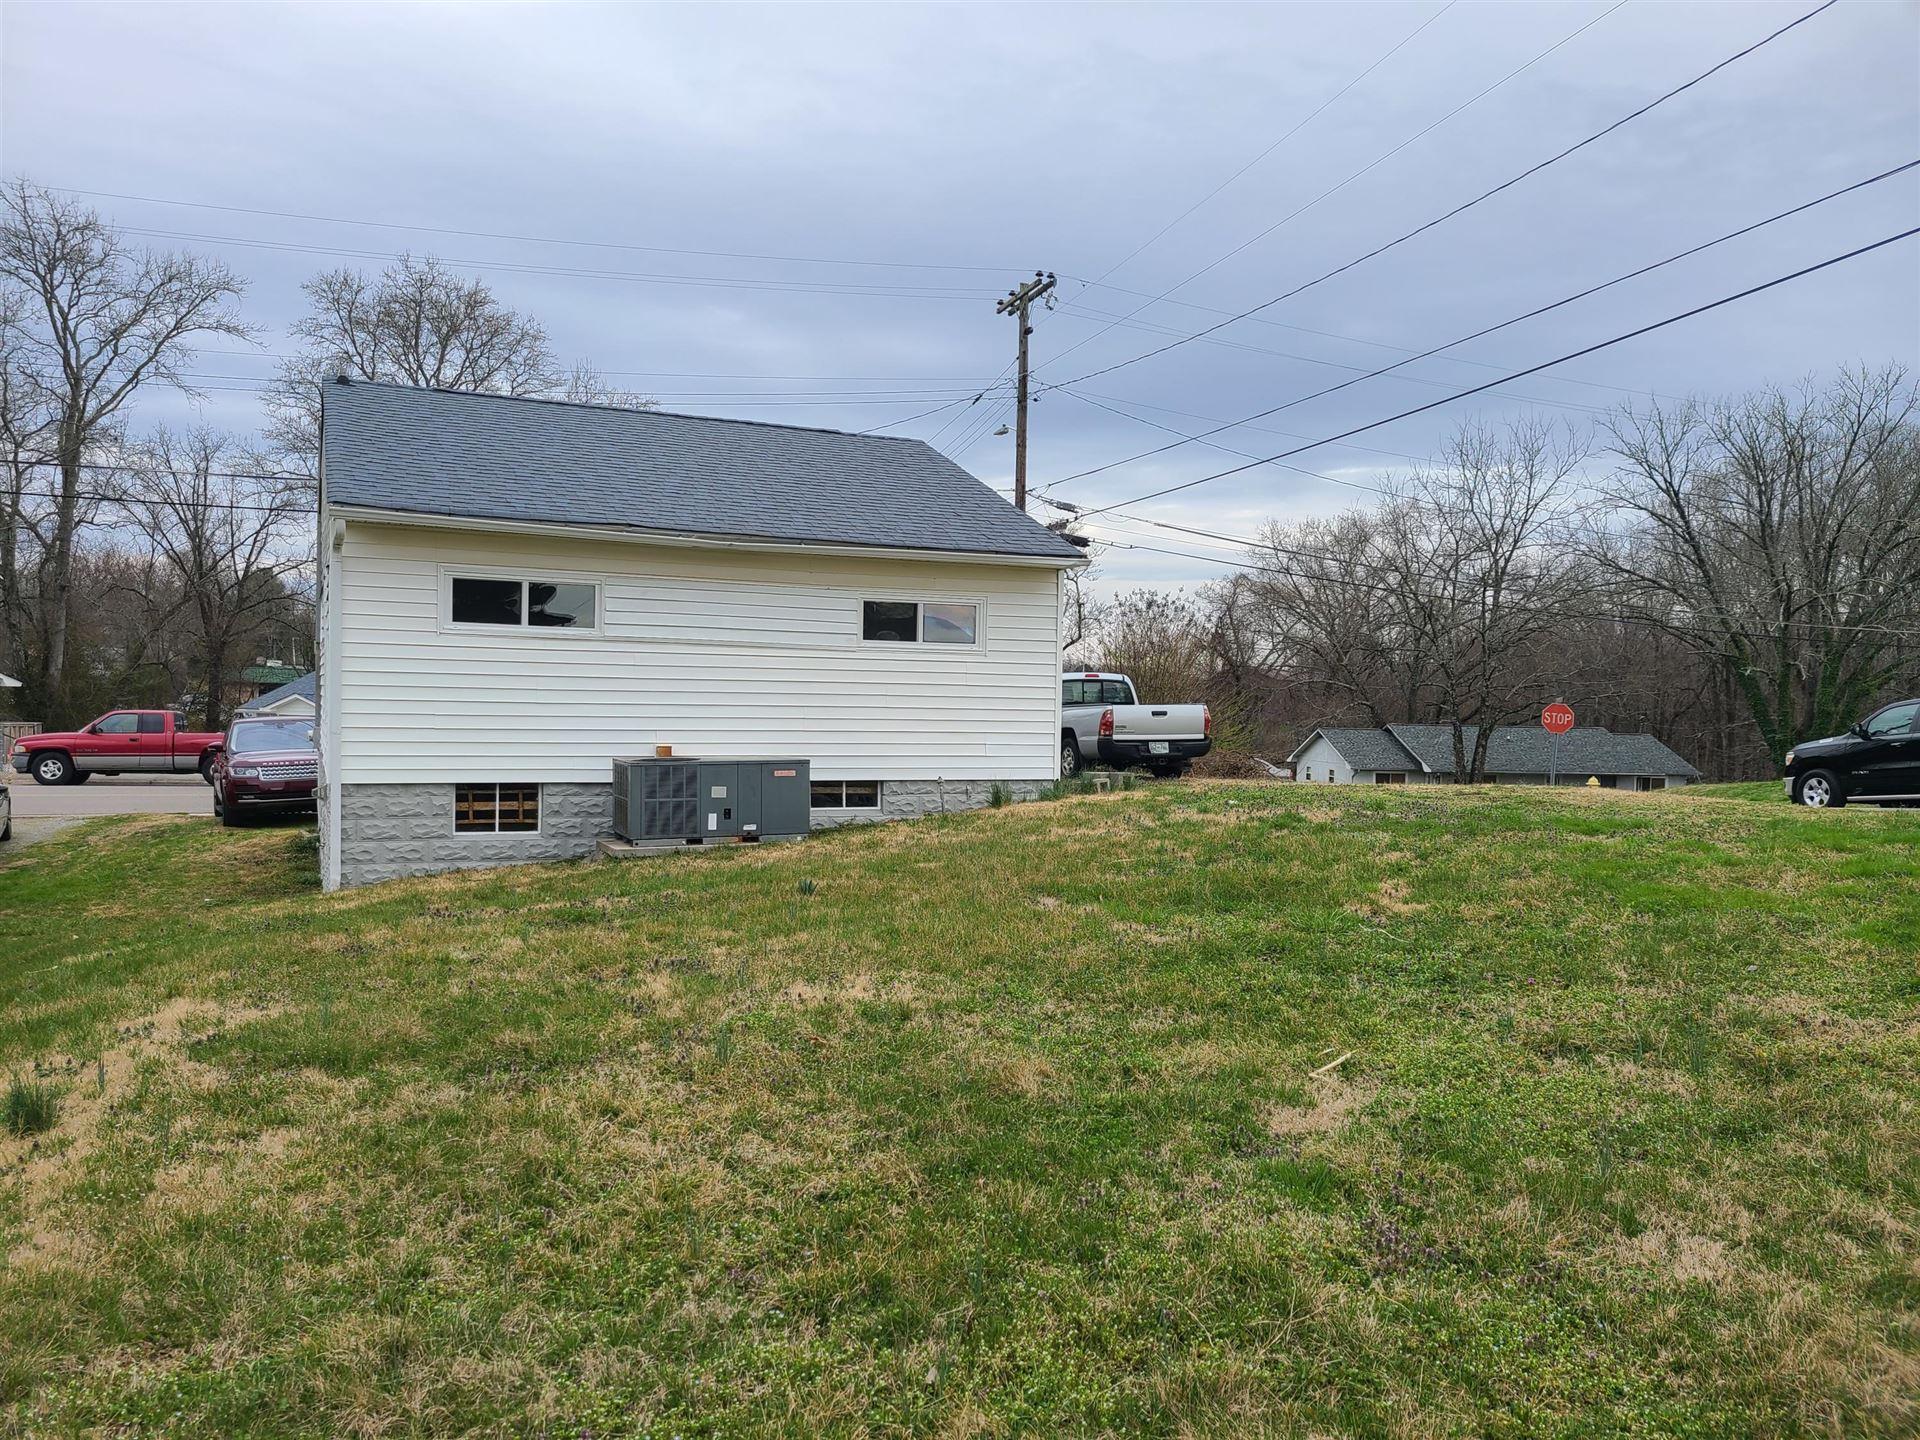 Photo of 179 Johnson Rd, Oak Ridge, TN 37830 (MLS # 1146170)